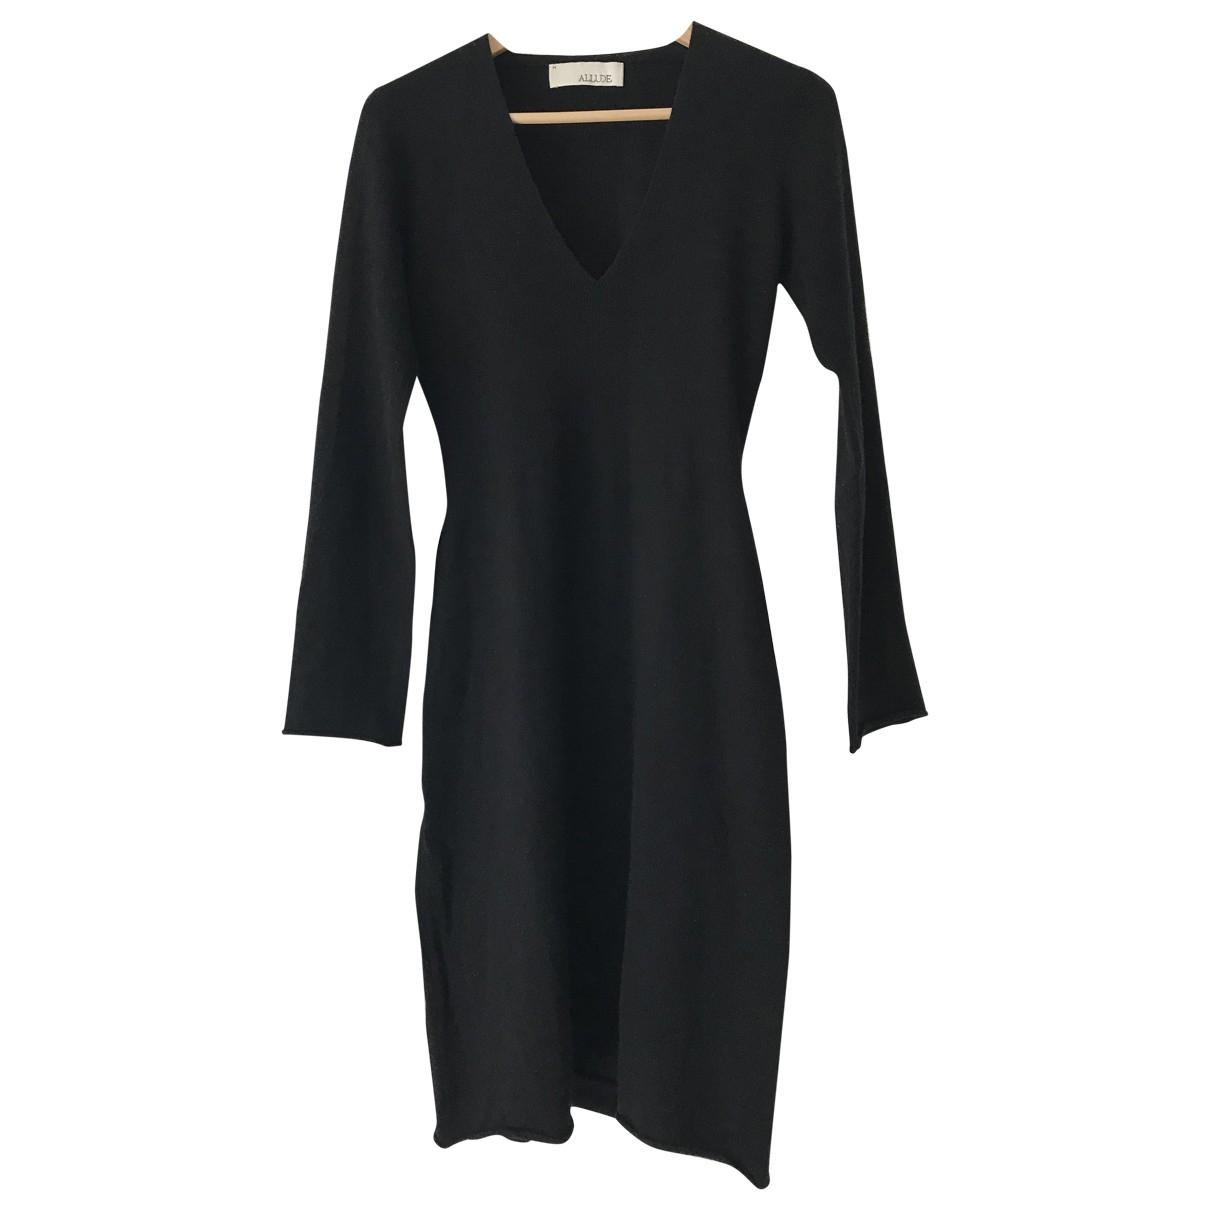 Allude N Black Cashmere dress for Women M International